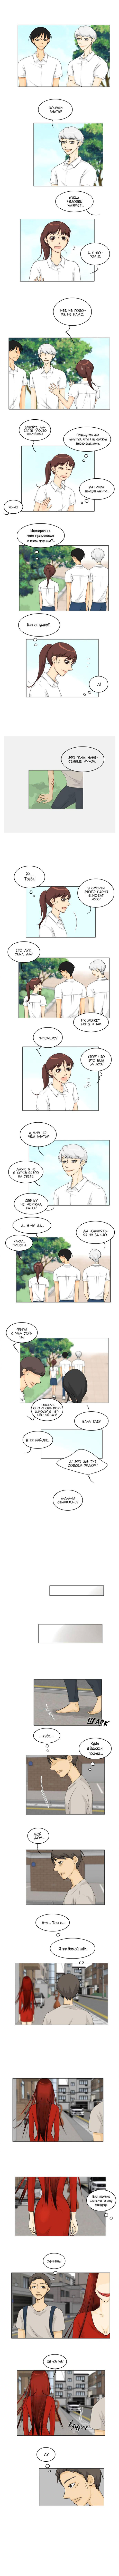 https://r2.ninemanga.com/comics/pic3/8/31048/1295162/1546305879773.jpg Page 2